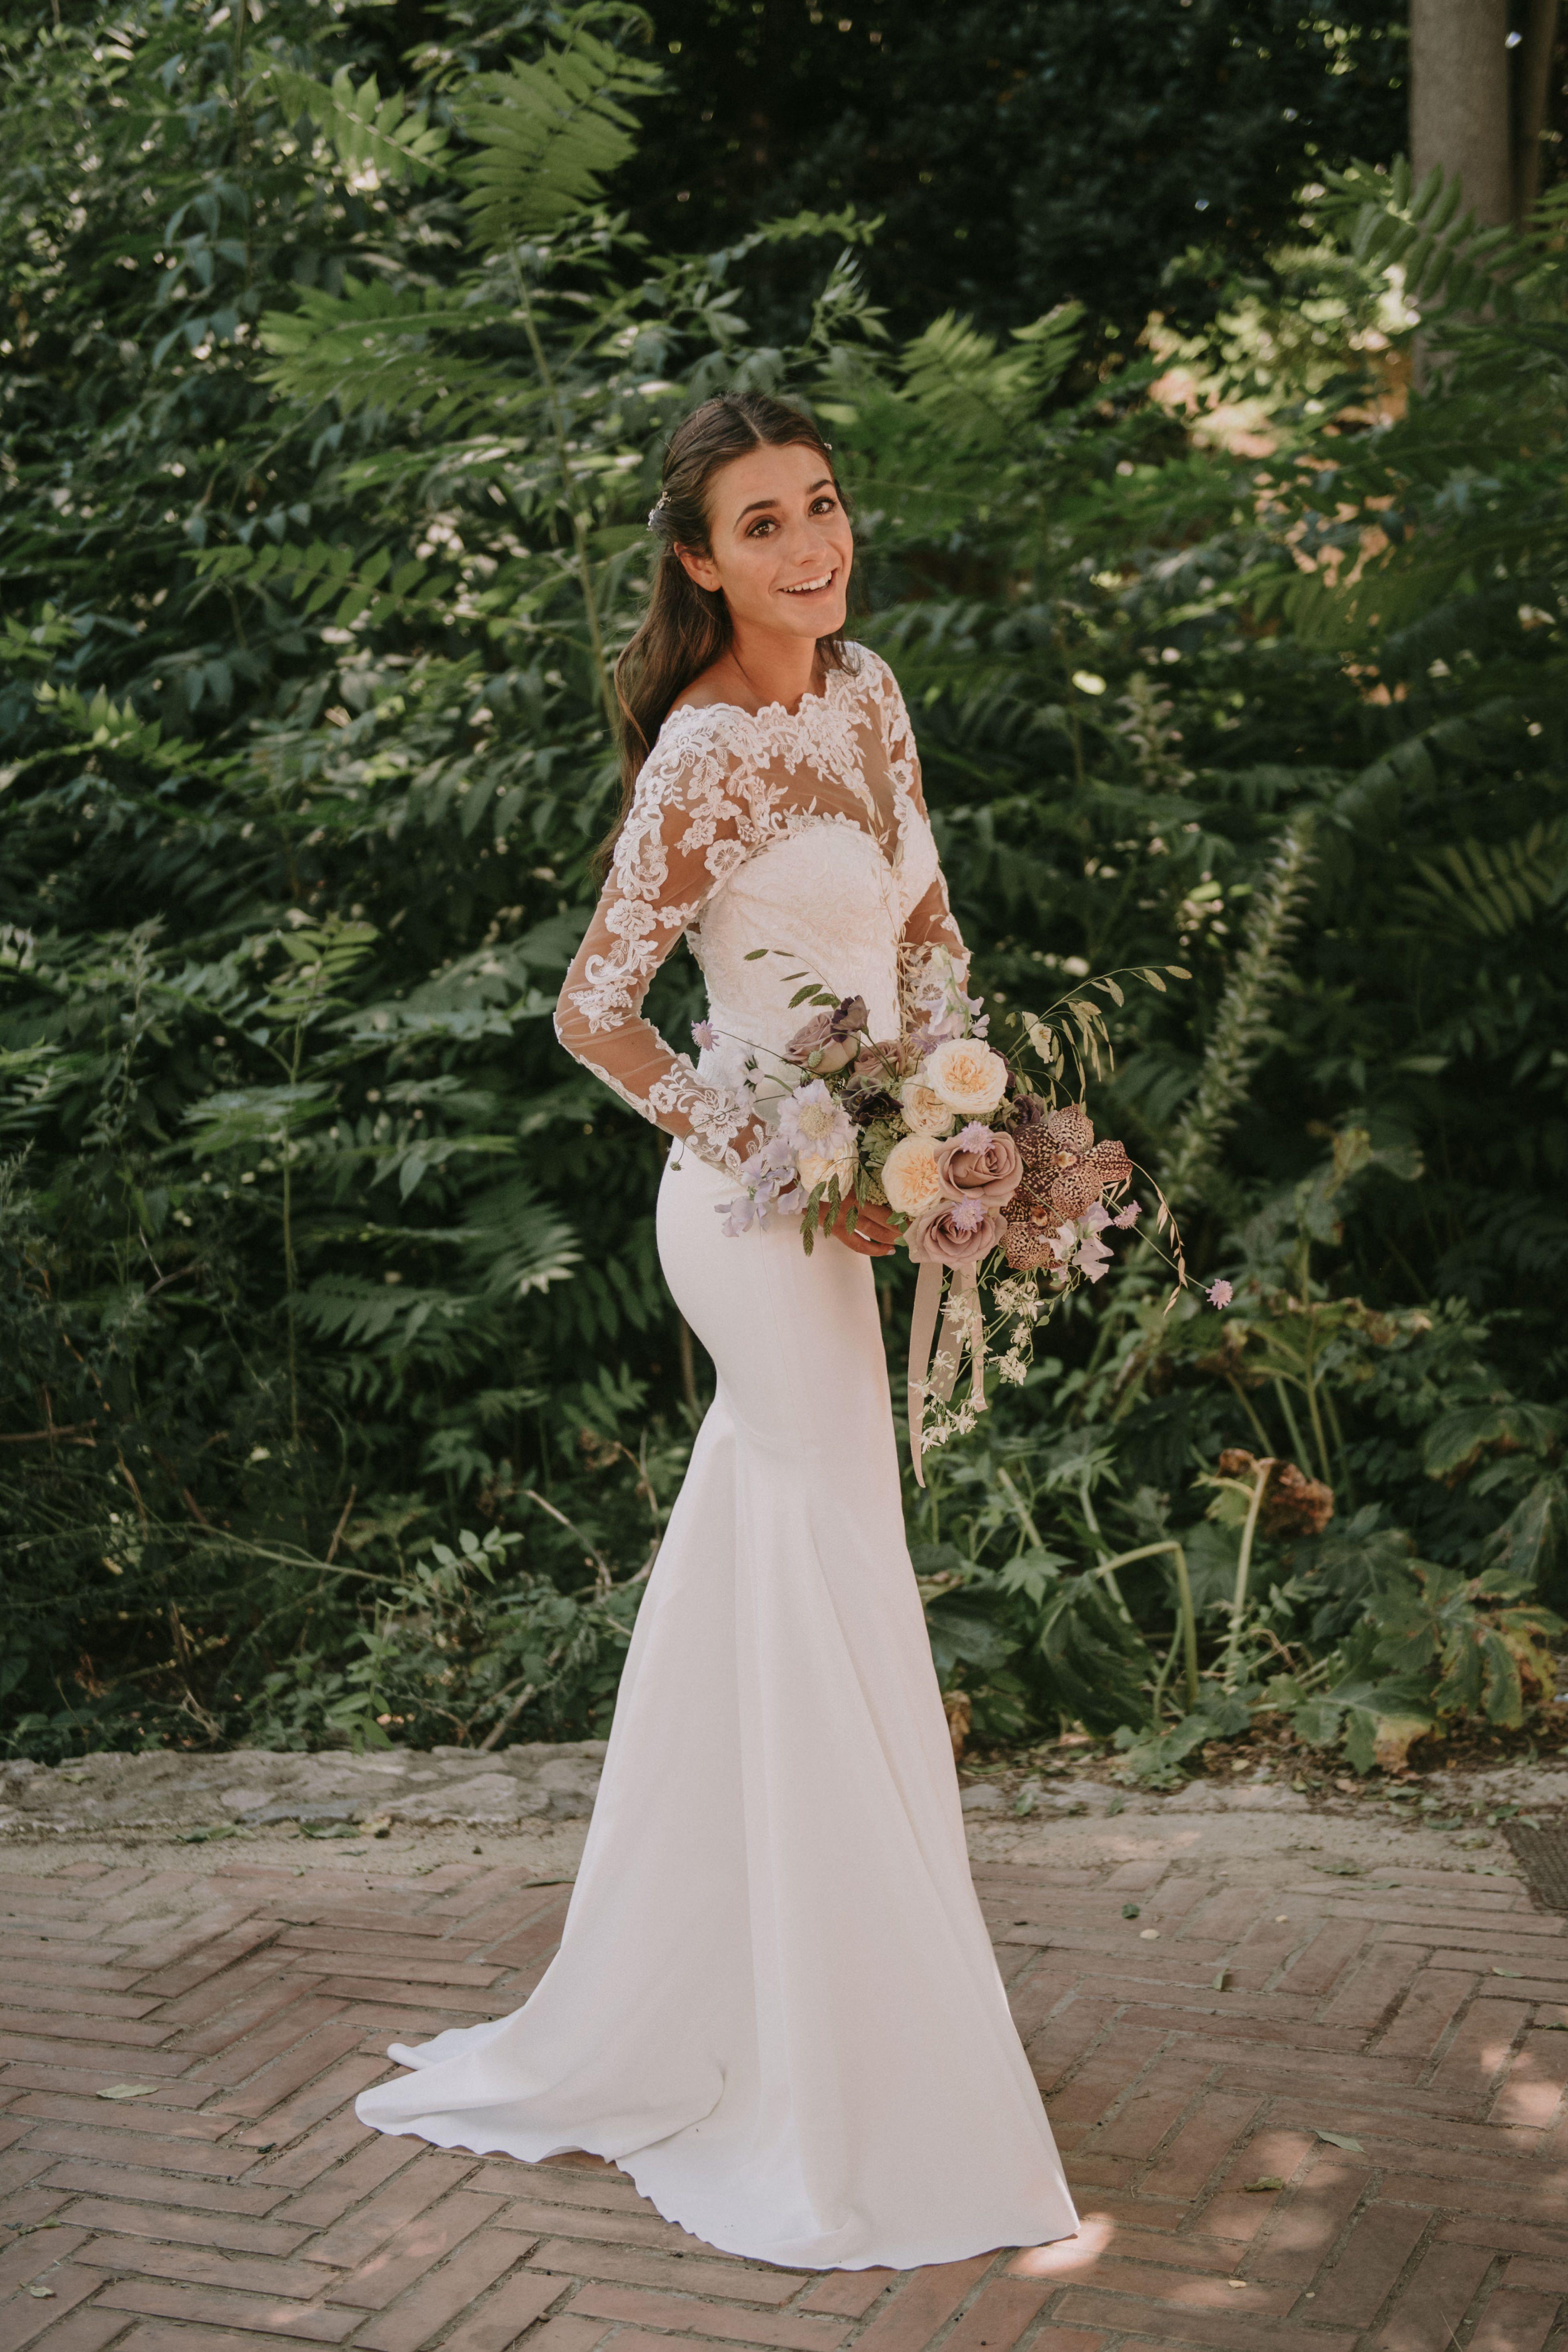 Crepe Wedding Dress With Mermaid Silhouette Long Sleeves And Bateau Neckline Dresses Wedding Dresses Crepe Wedding Dress [ 5859 x 3906 Pixel ]